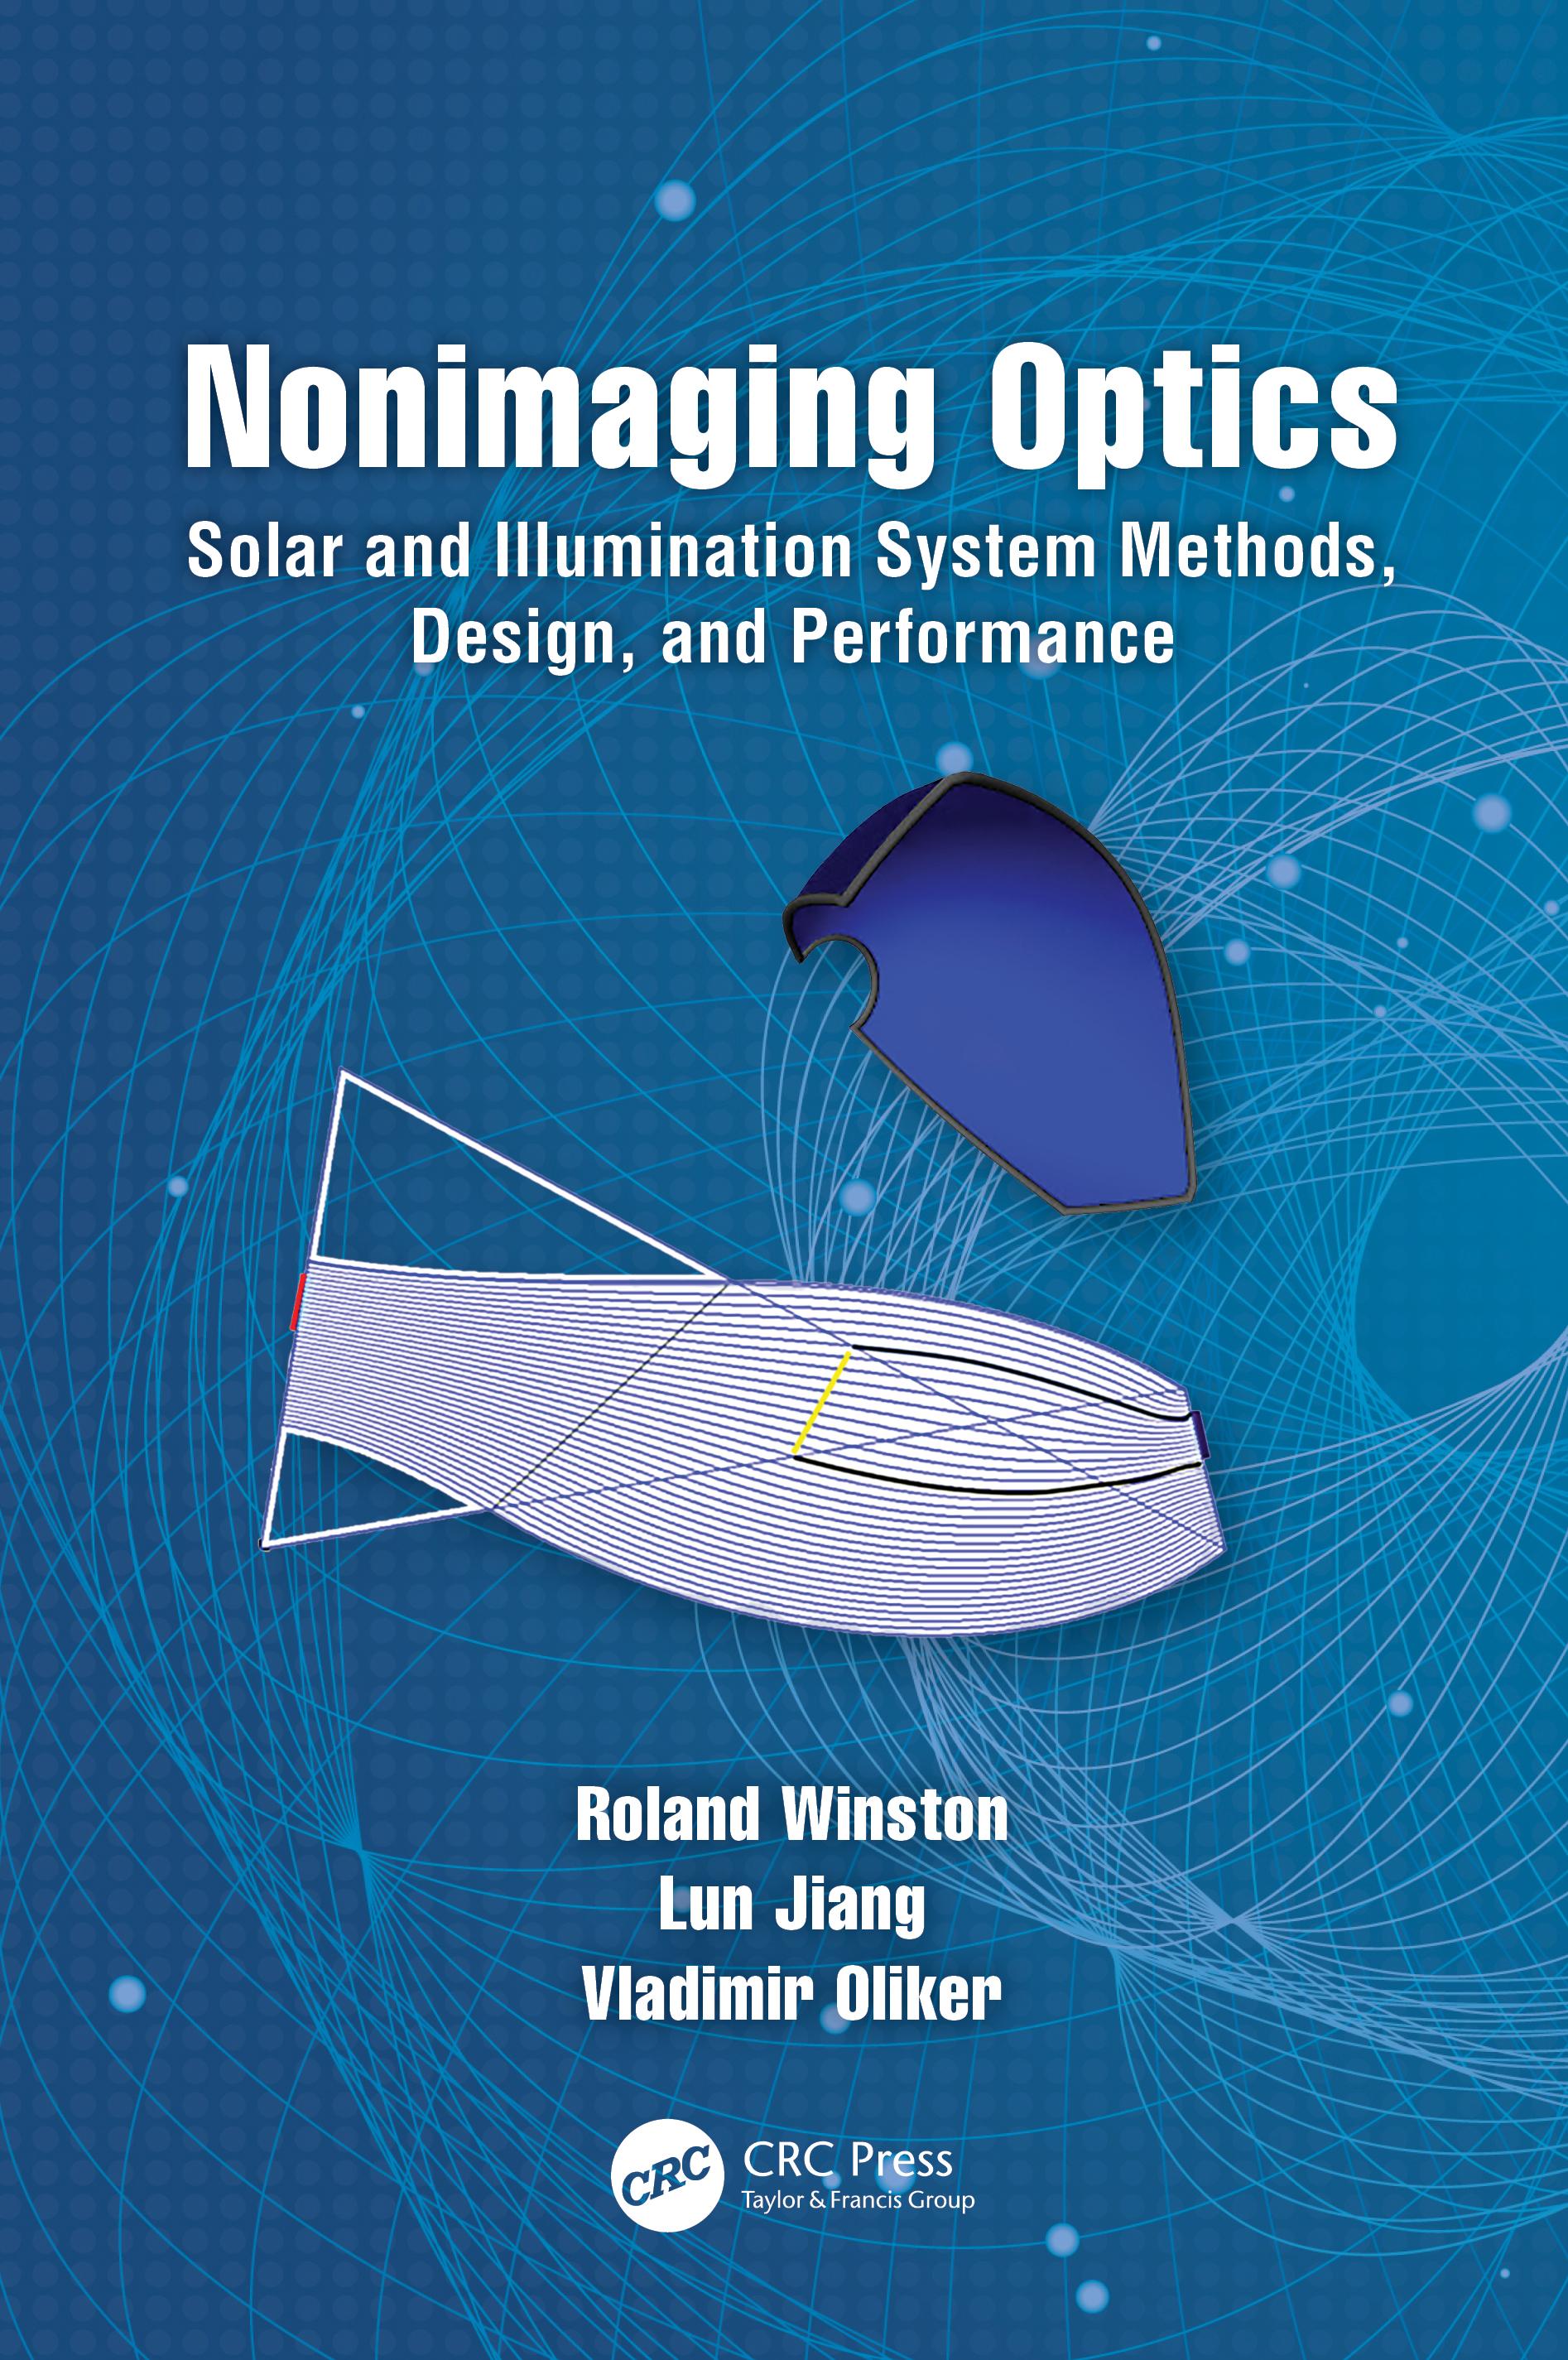 Nonimaging Optics: Solar and Illumination System Methods, Design, and Performance, 1st Edition (Hardback) book cover